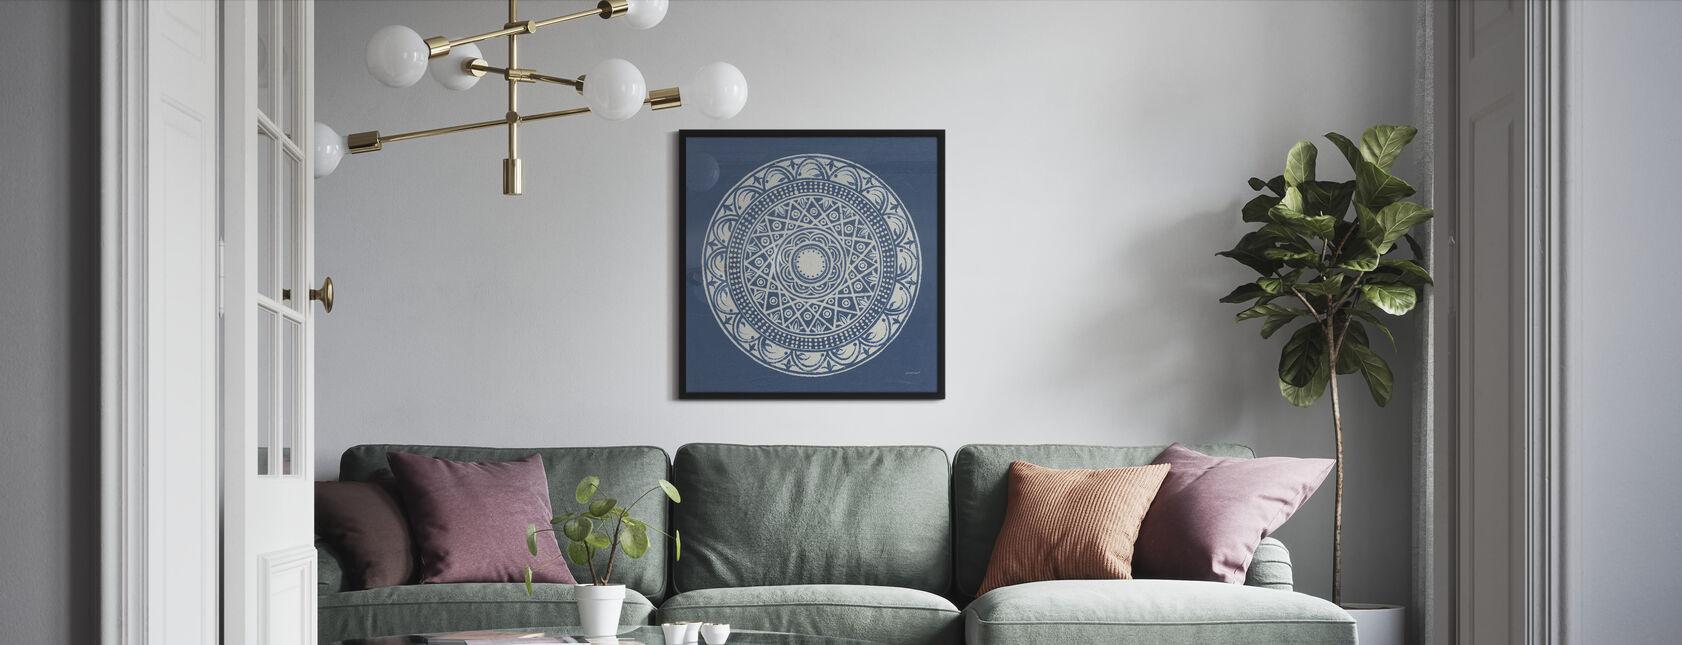 Sevilla Mandala III - Indrammet billede - Stue